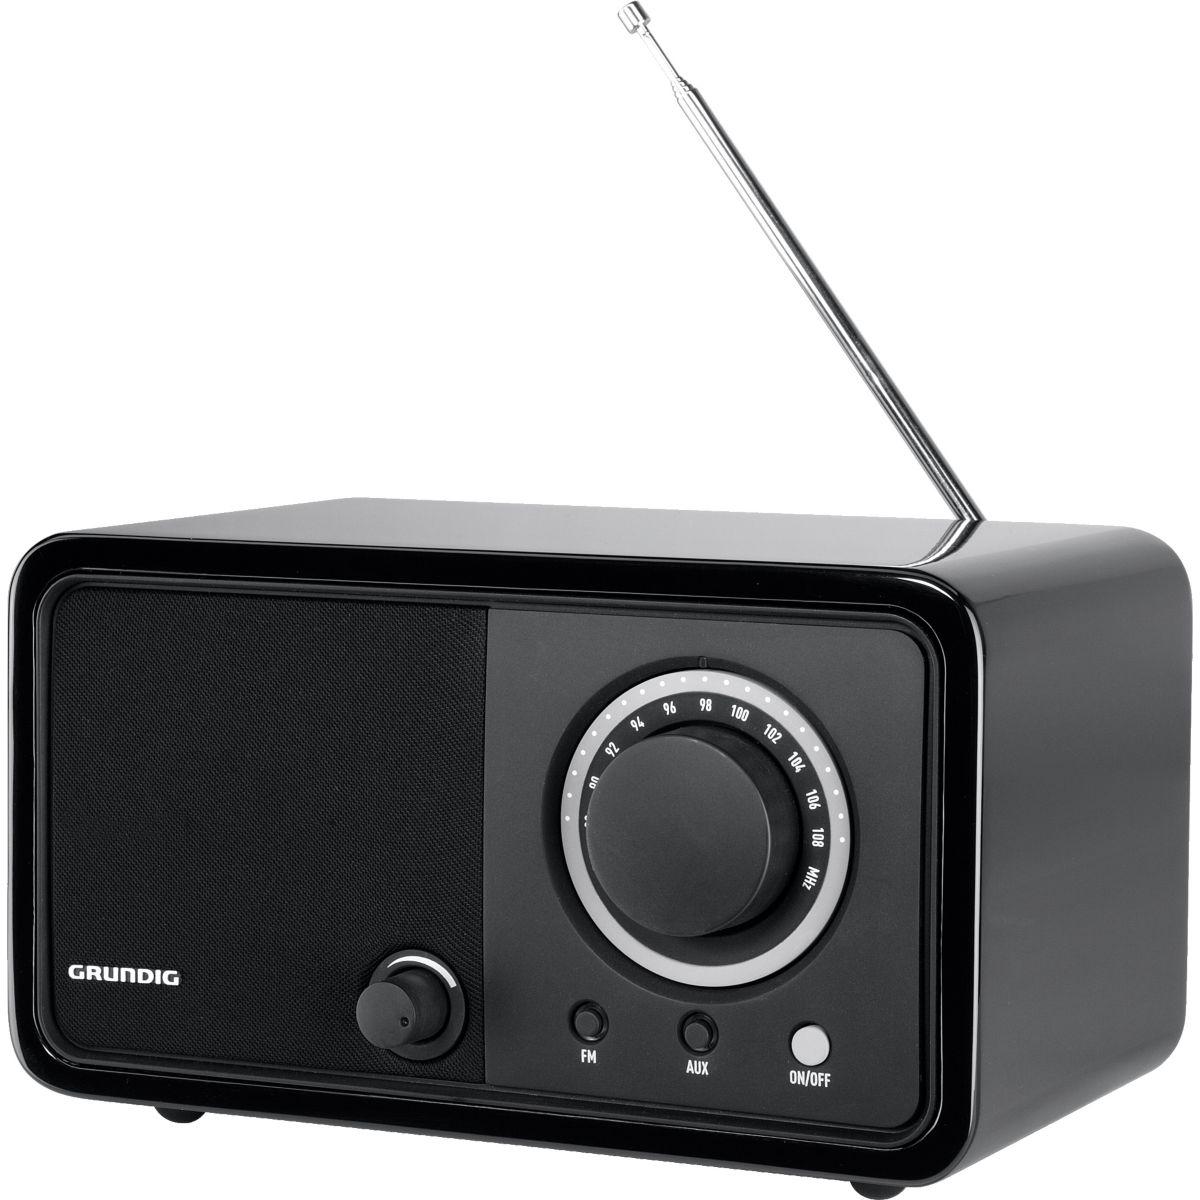 Radio analogique grundig tr 1200 black - 15% de remise imm�diate avec le code : automne1